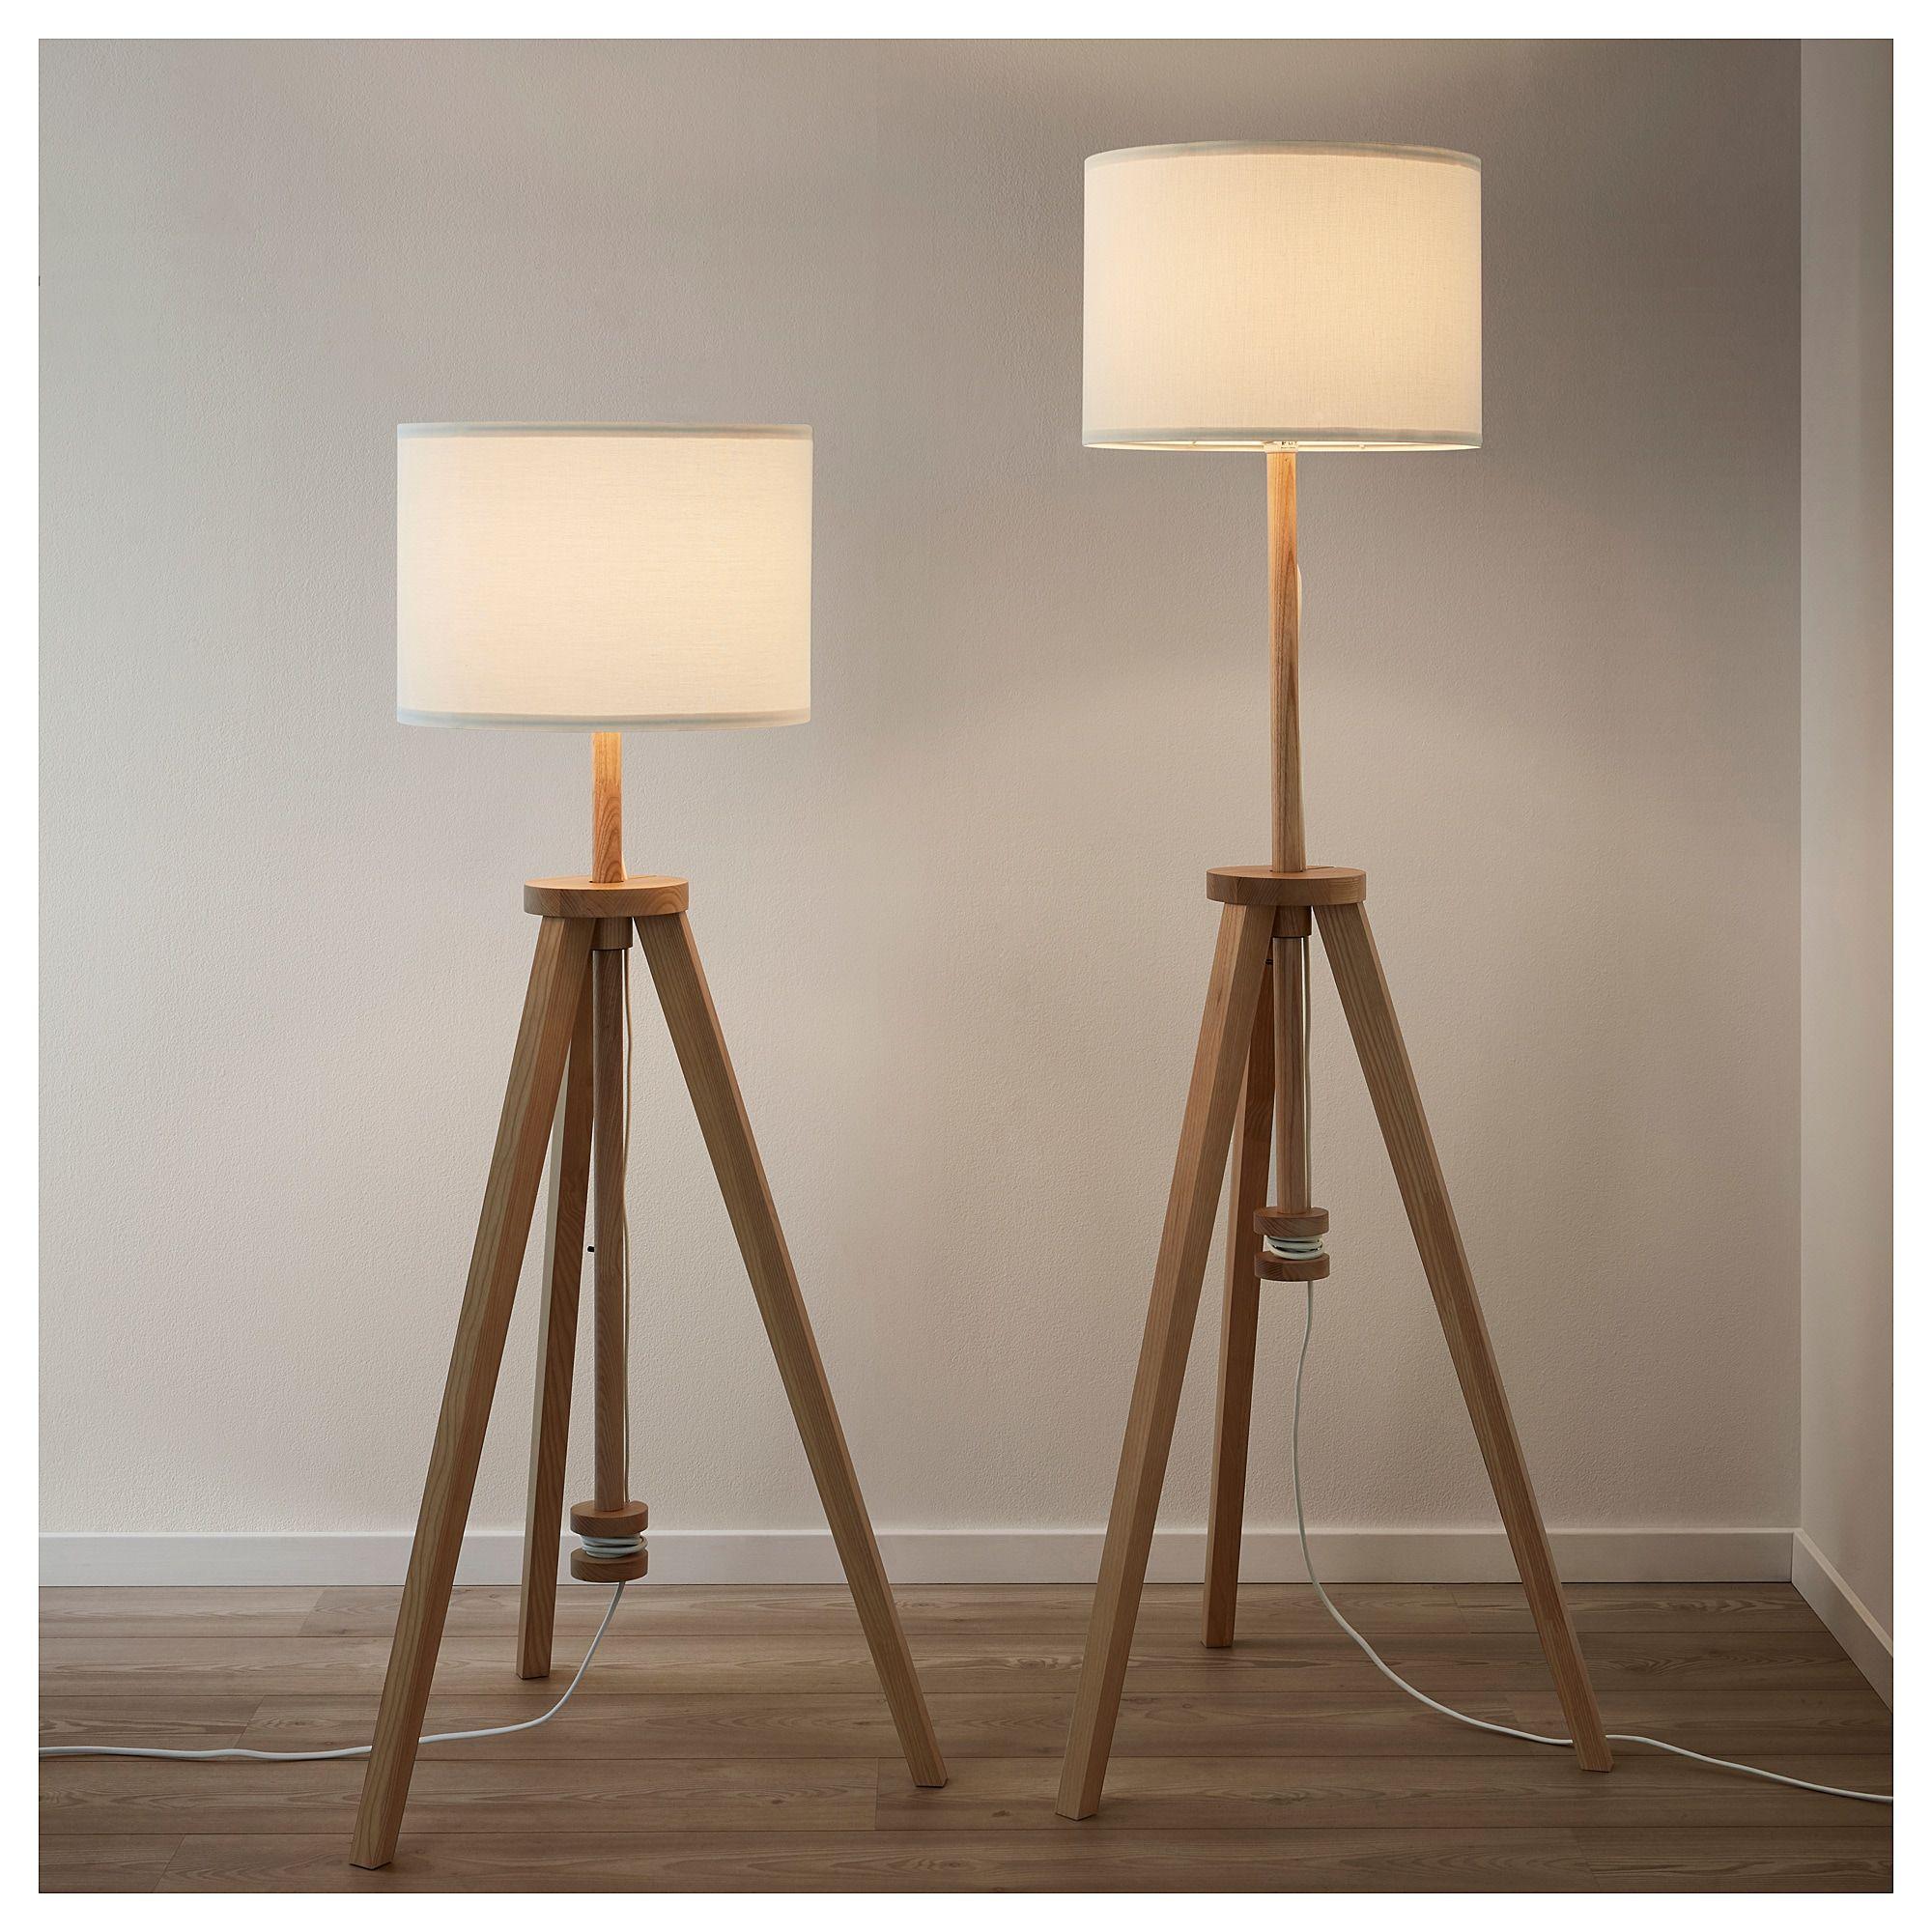 Lauters Standleuchte Esche Weiss Ikea Osterreich Floor Lamp Lamp White Floor Lamp